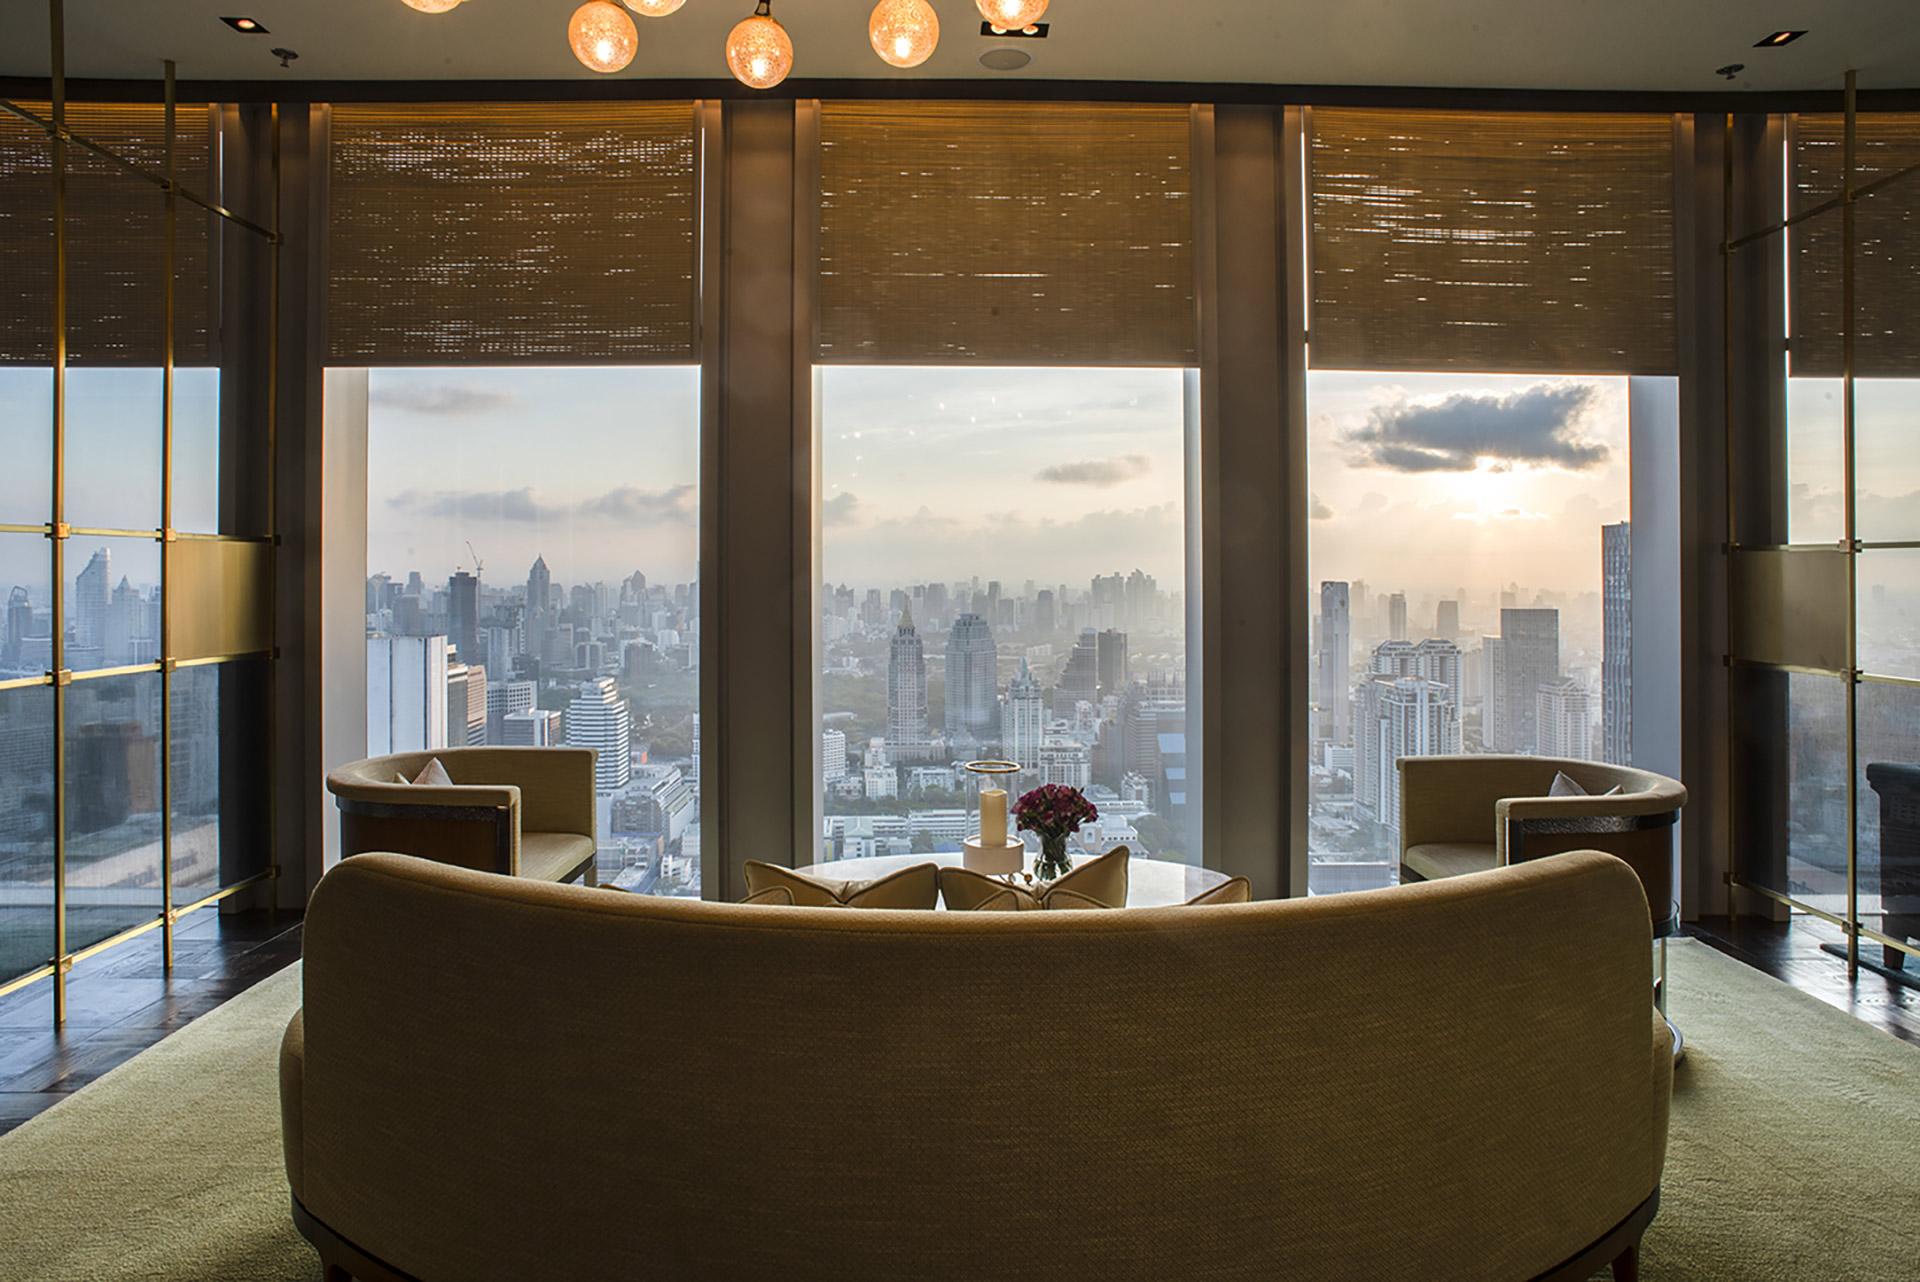 The Ritz Carlton Residences